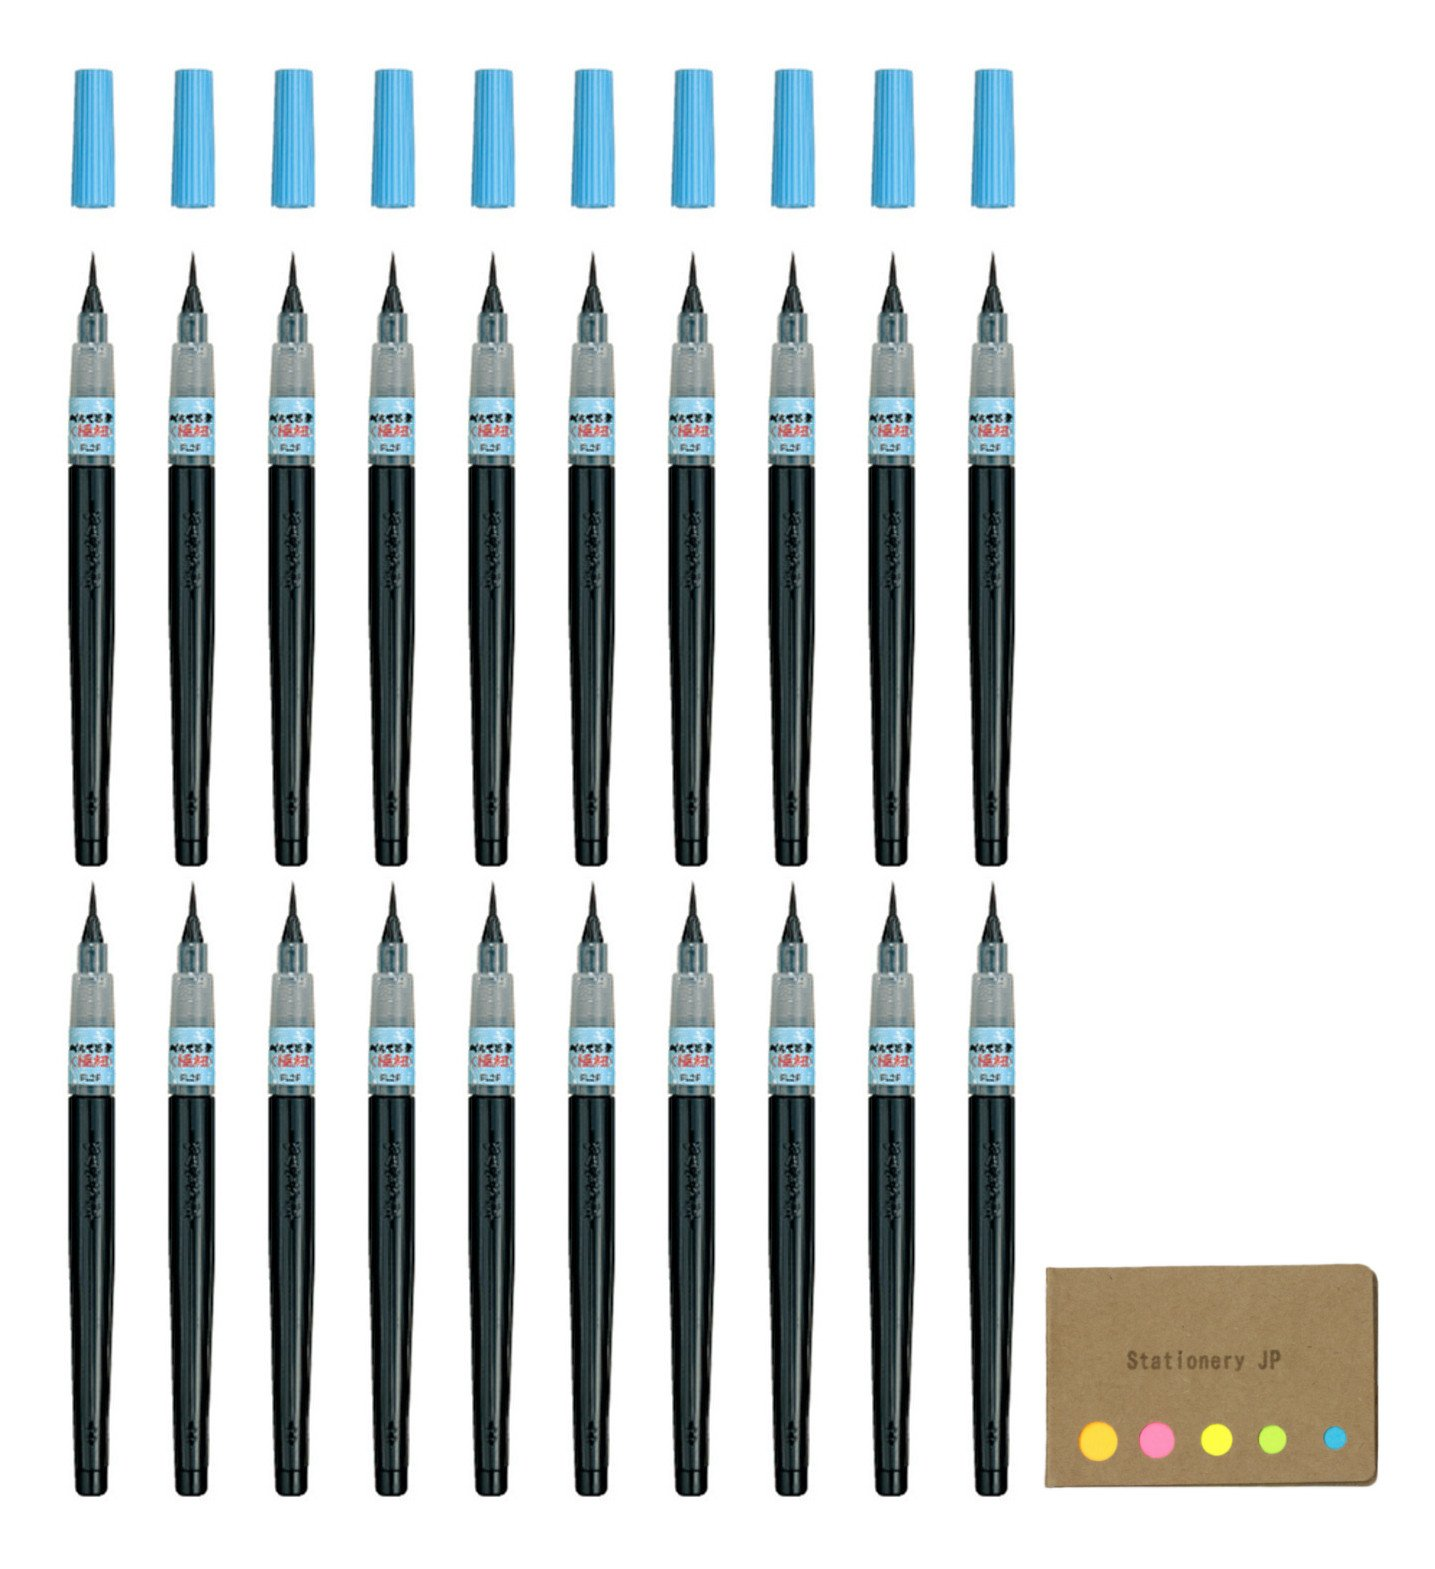 Pentel Fude Brush Pen, Extra Fine, 20-pack, Sticky Notes Value Set